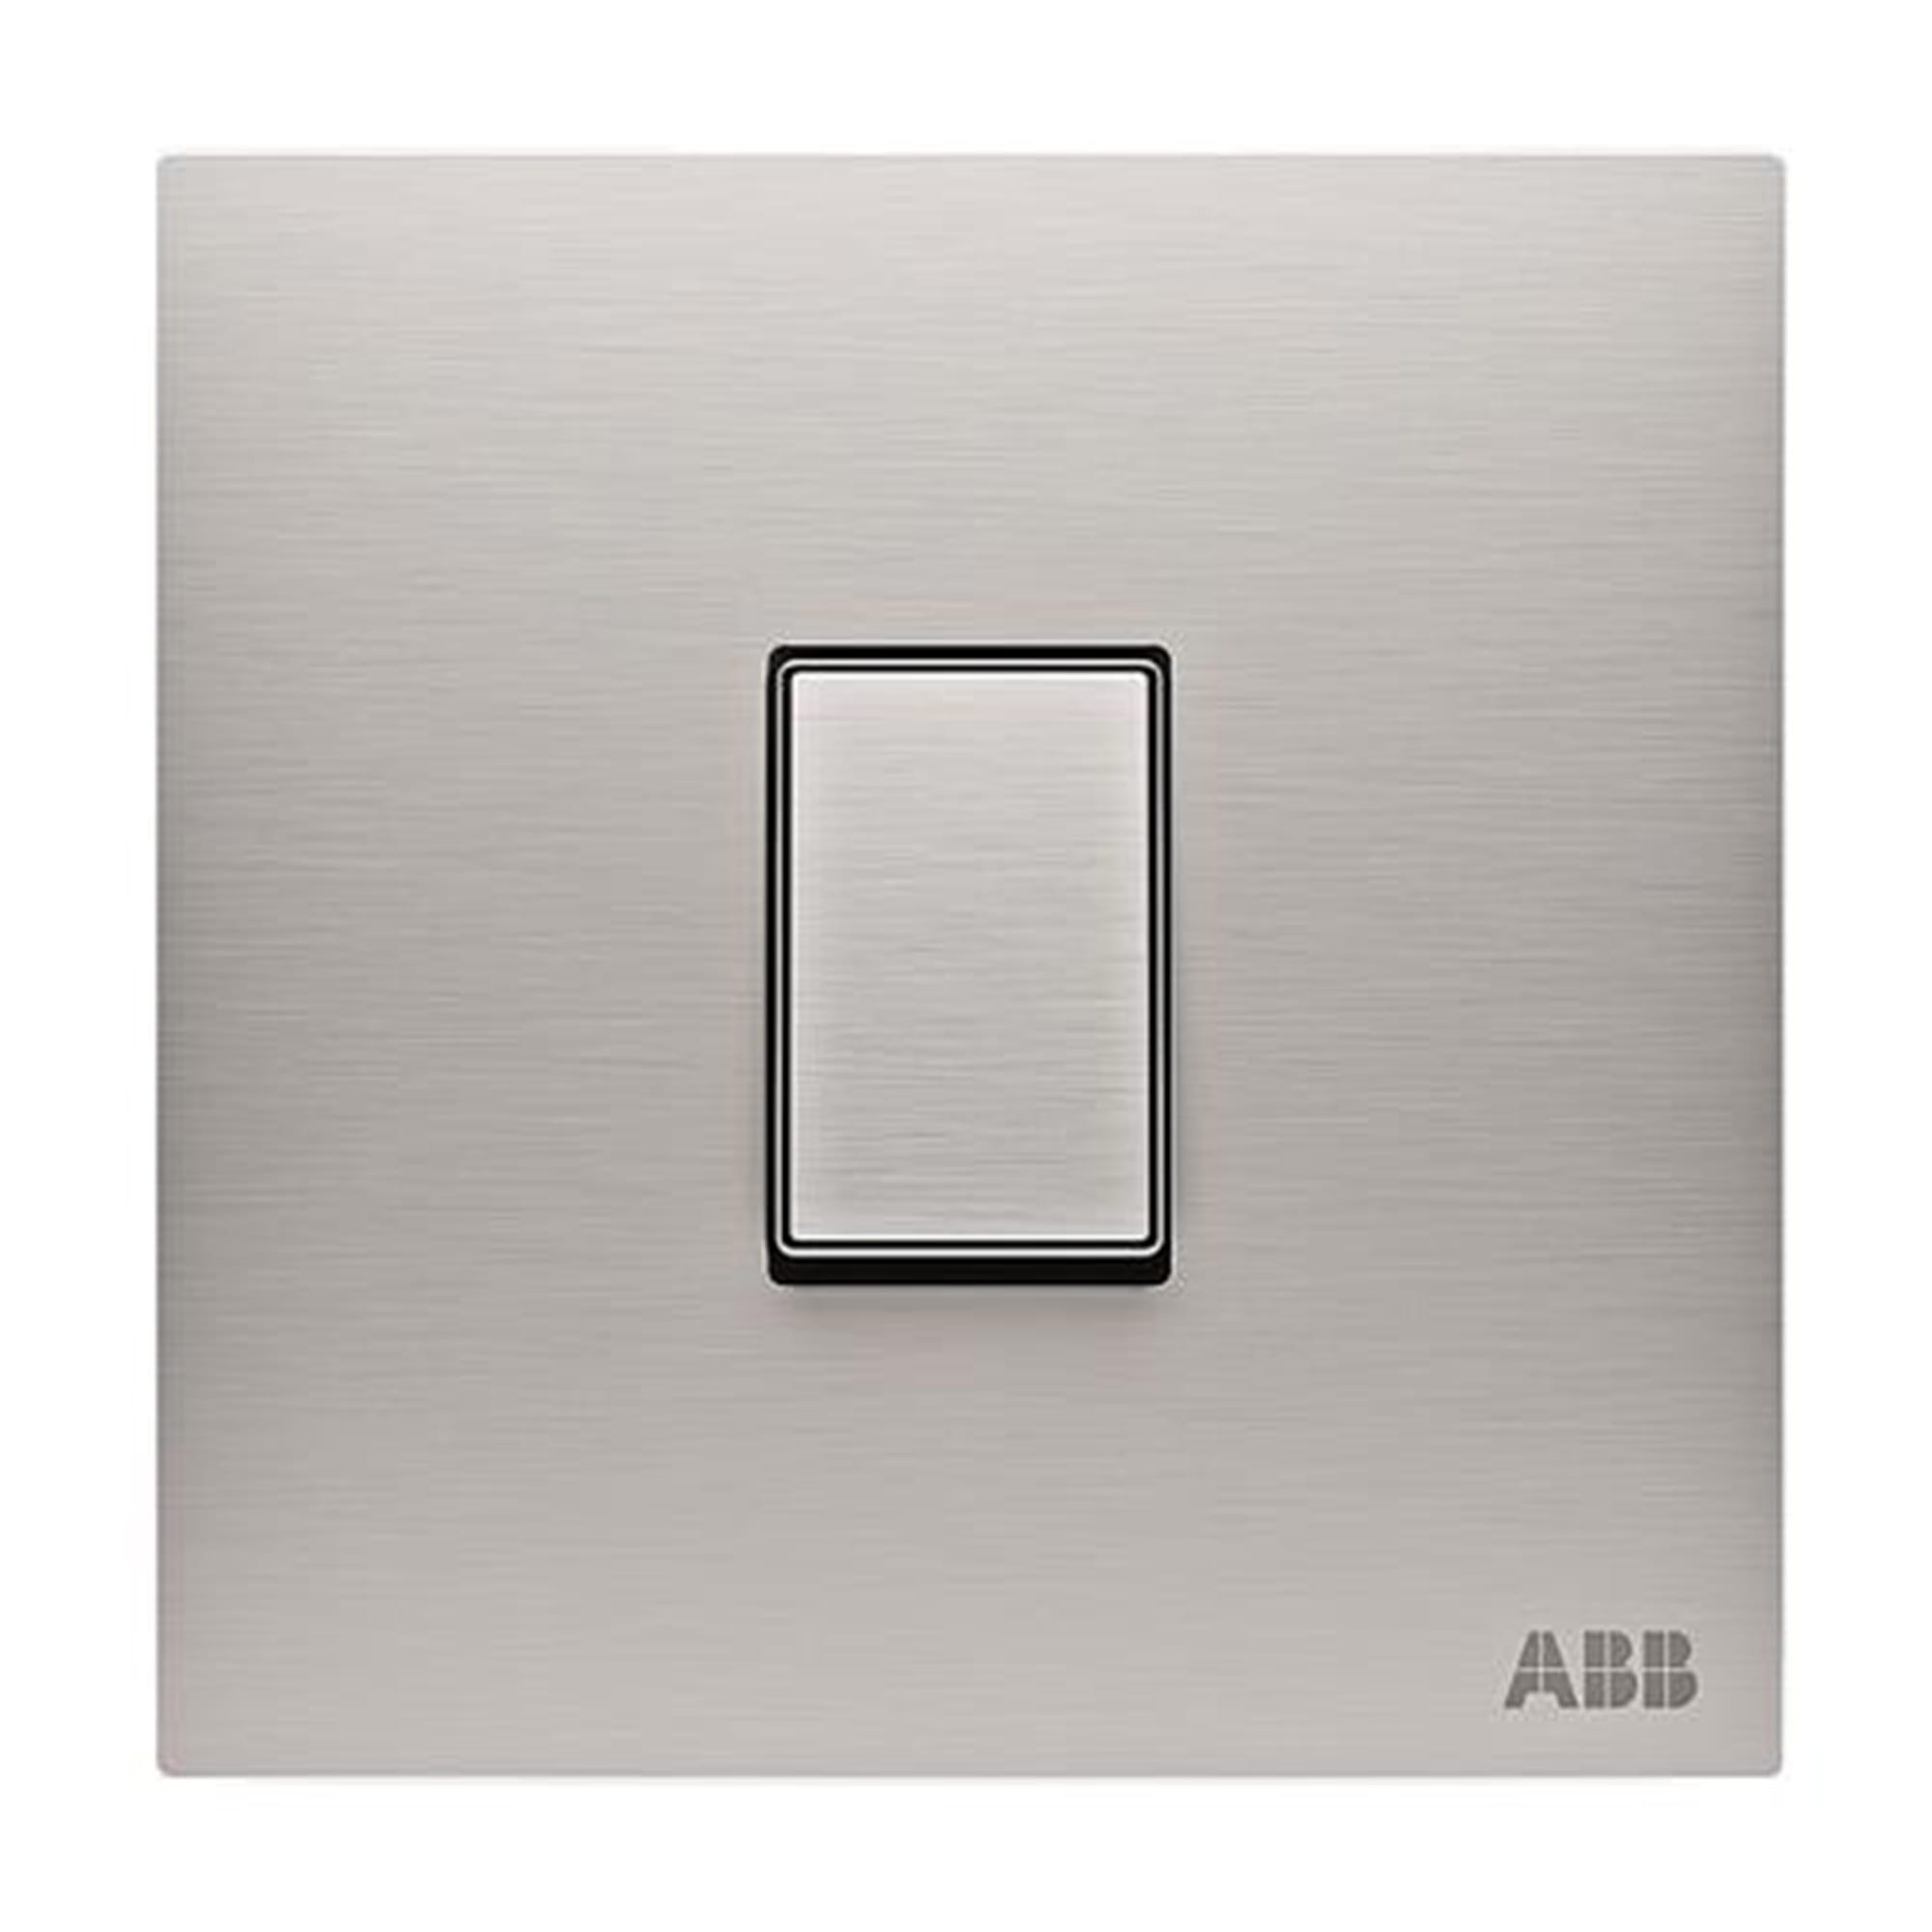 Abb Push-button 1-gang 1-way Sp 10a